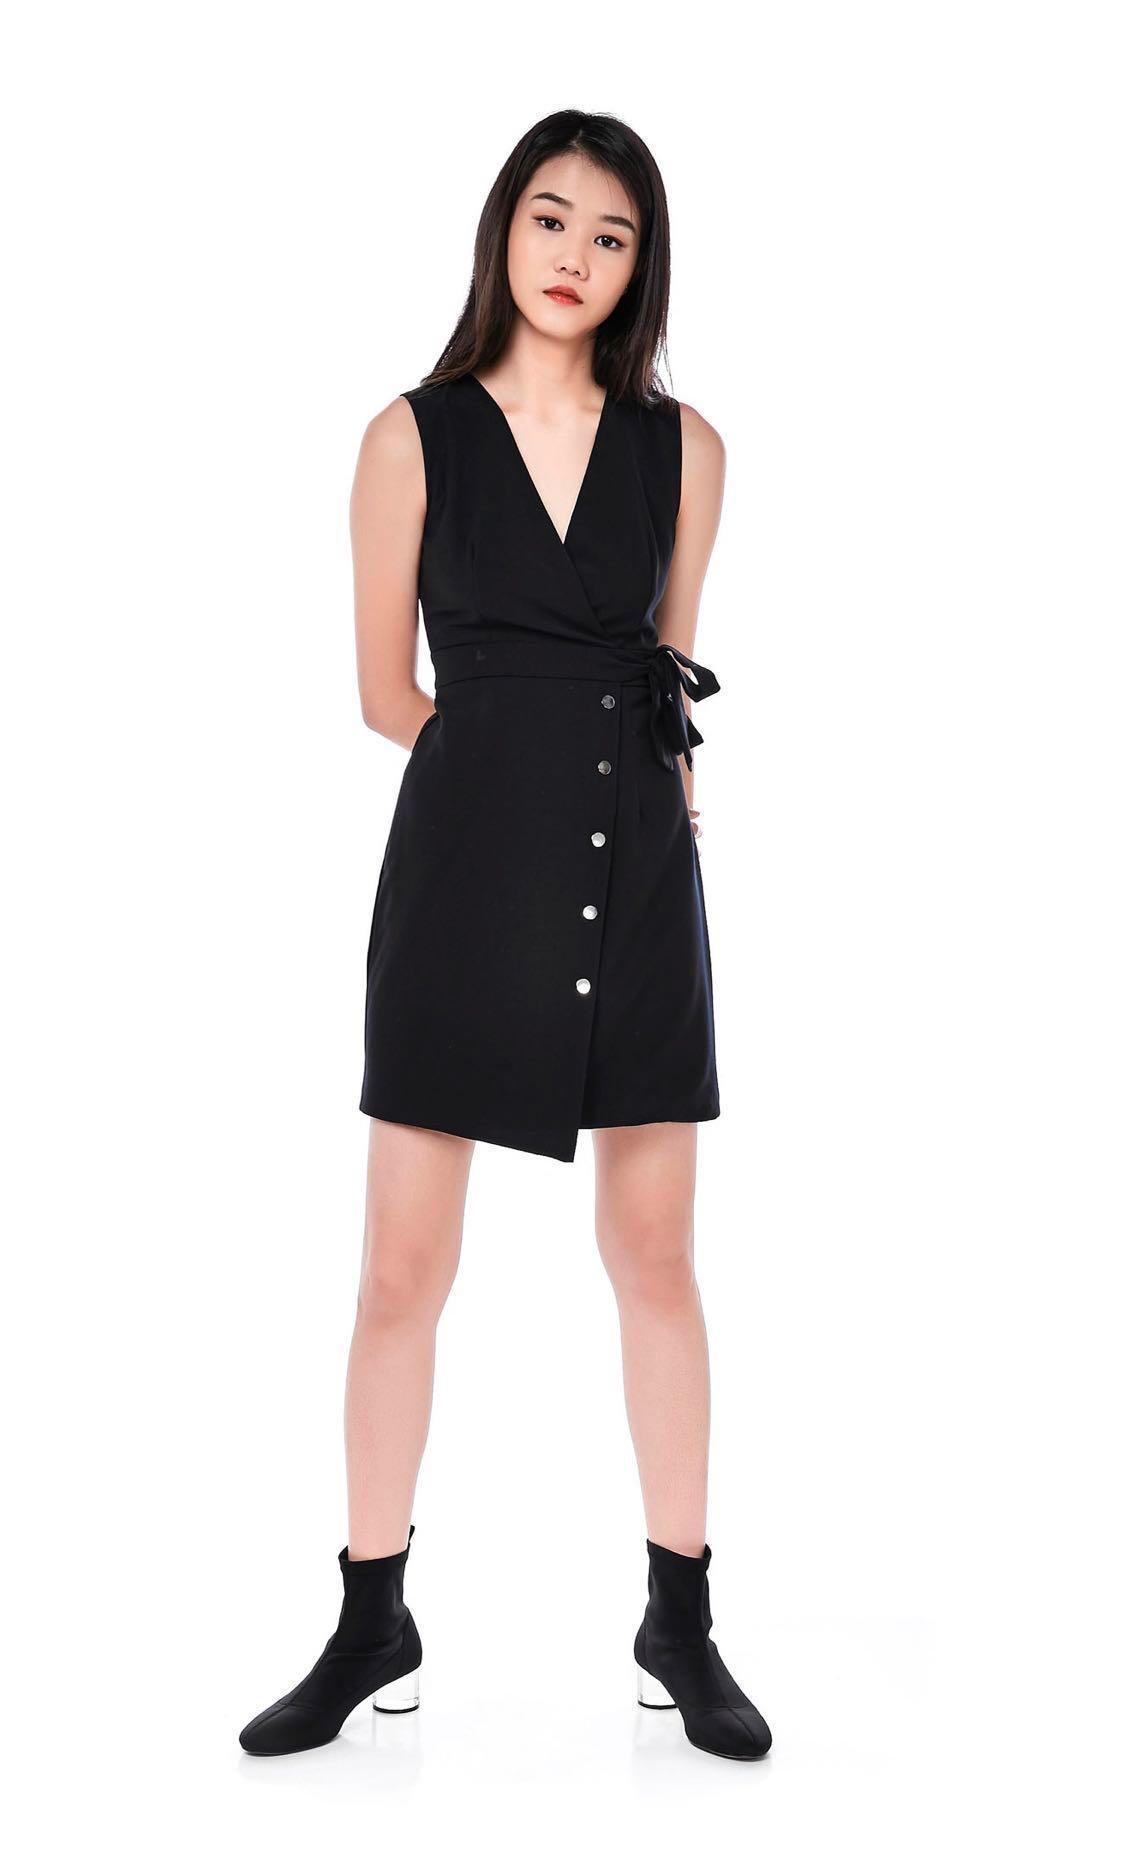 TEM black wrap dress with silver button details - XS